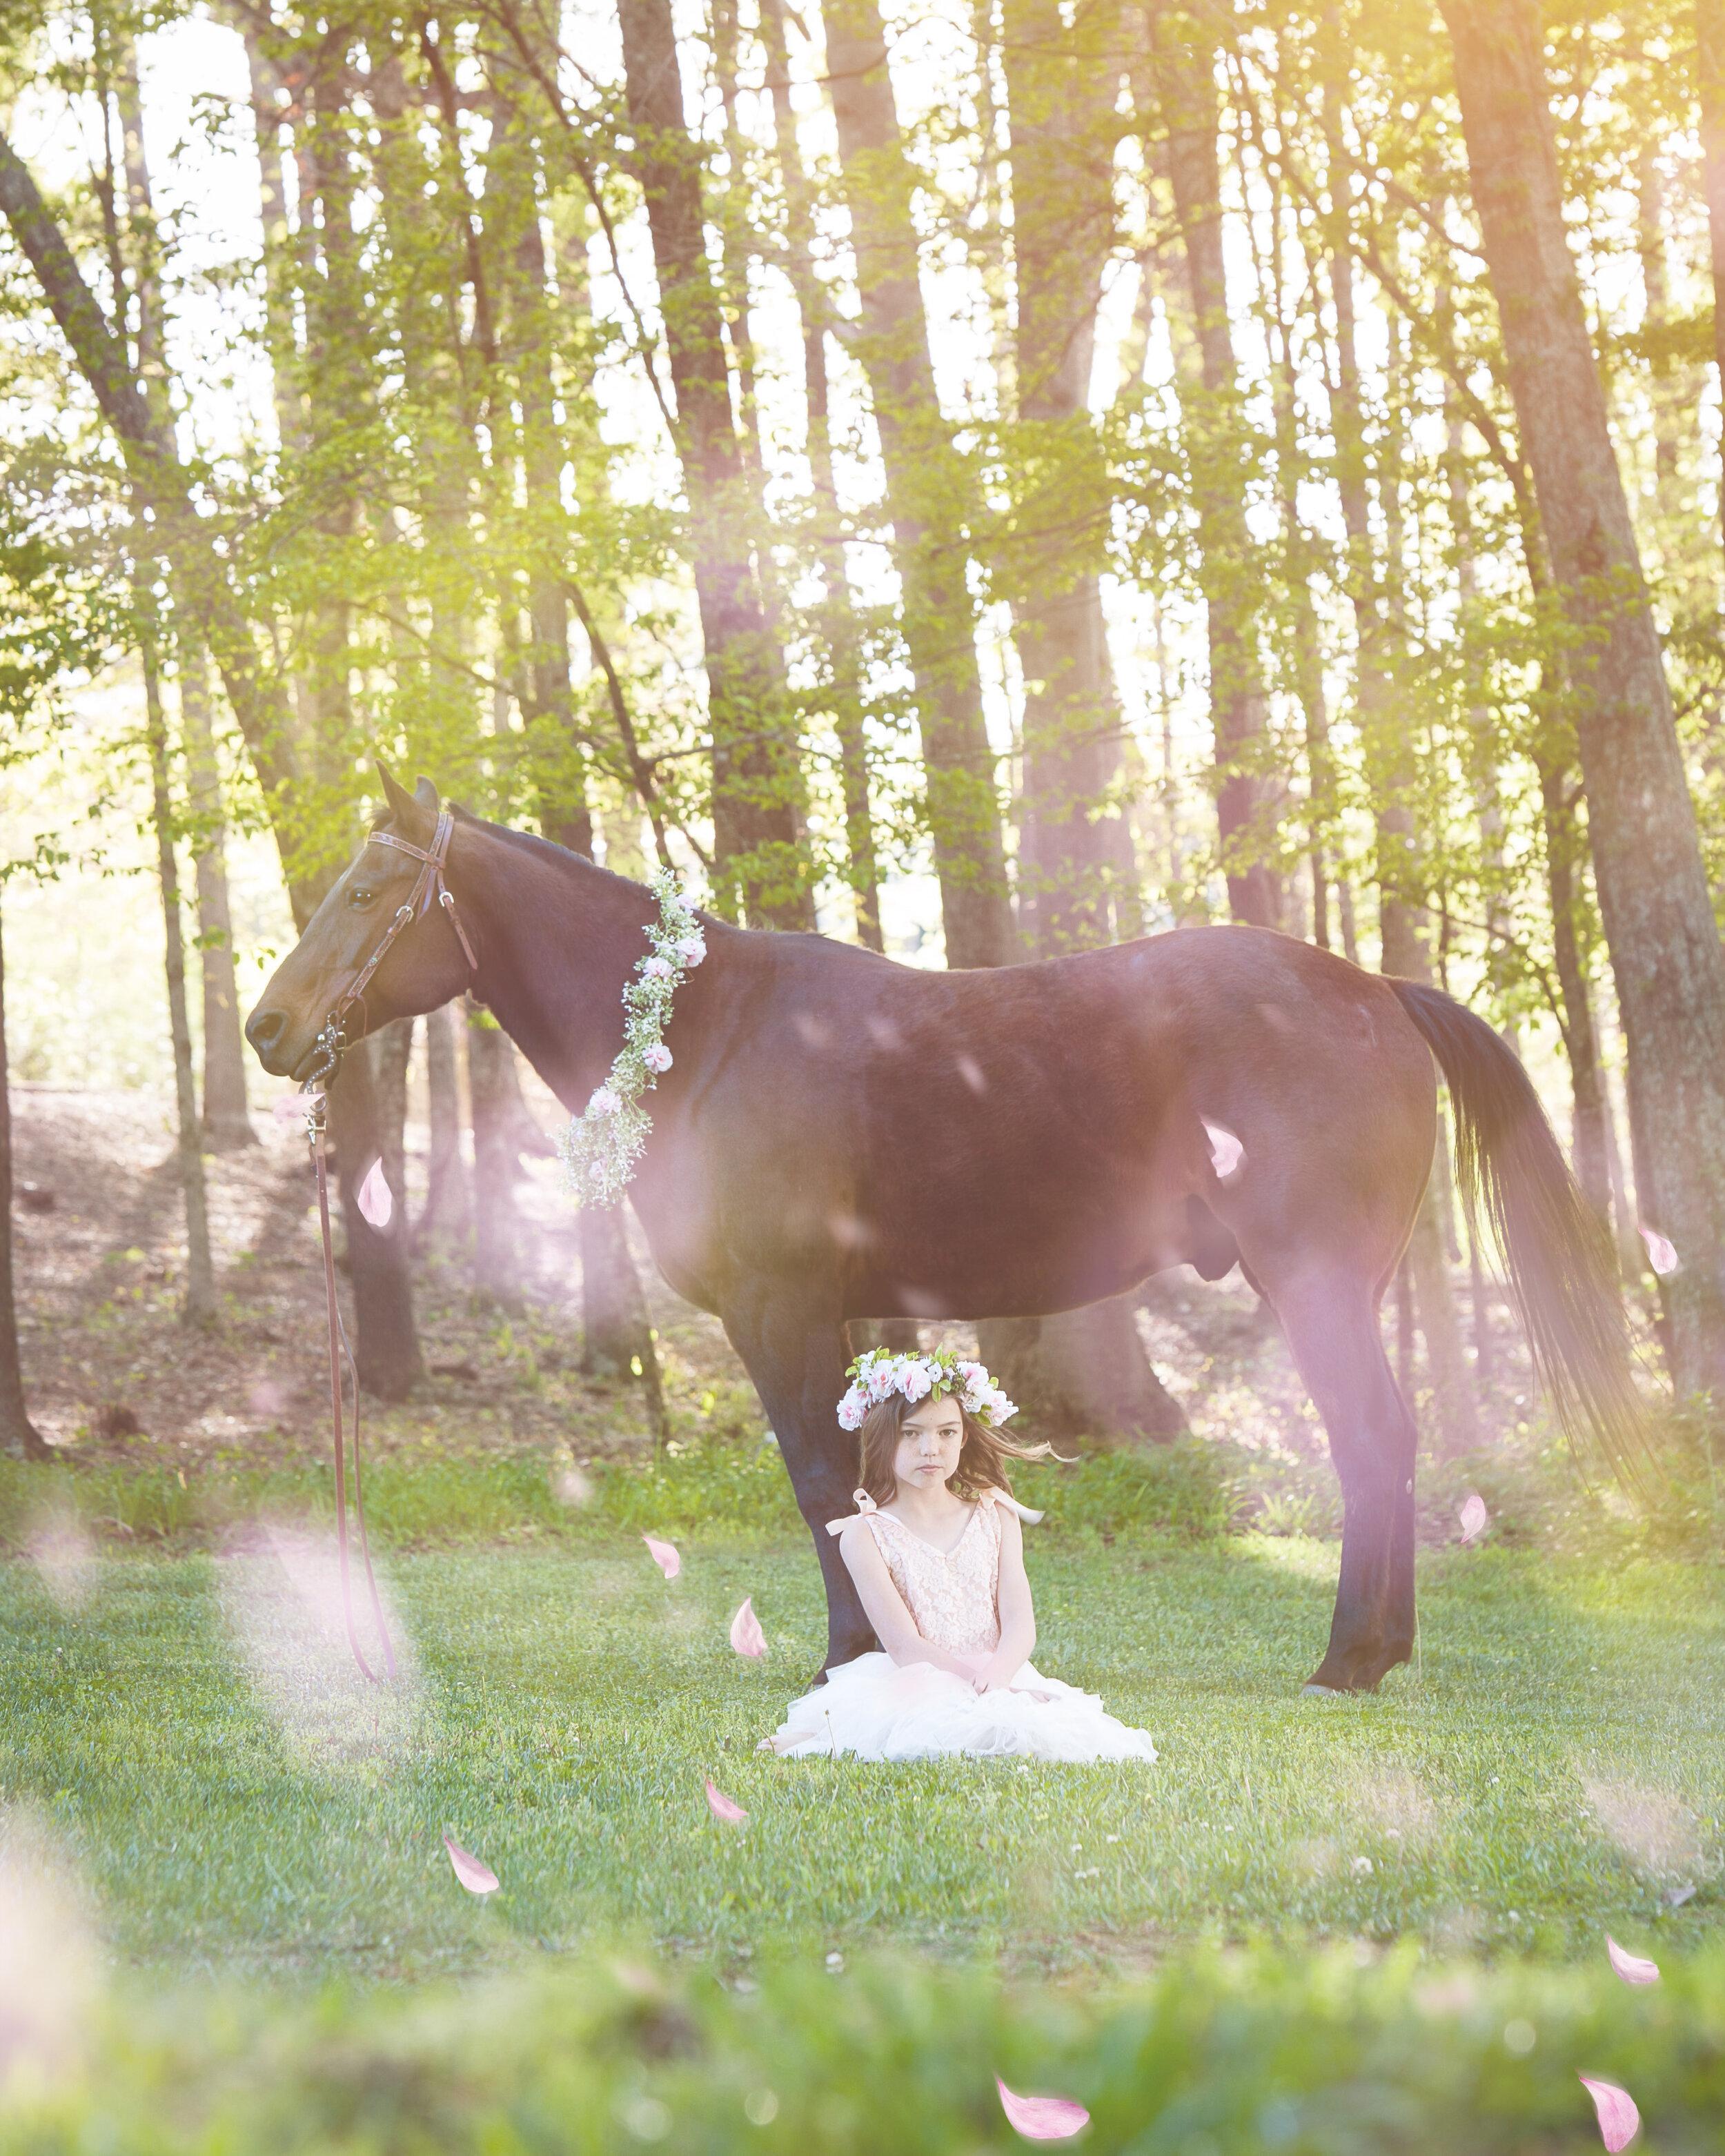 Kid EquestrainPhotographerKevinLamb.jpg